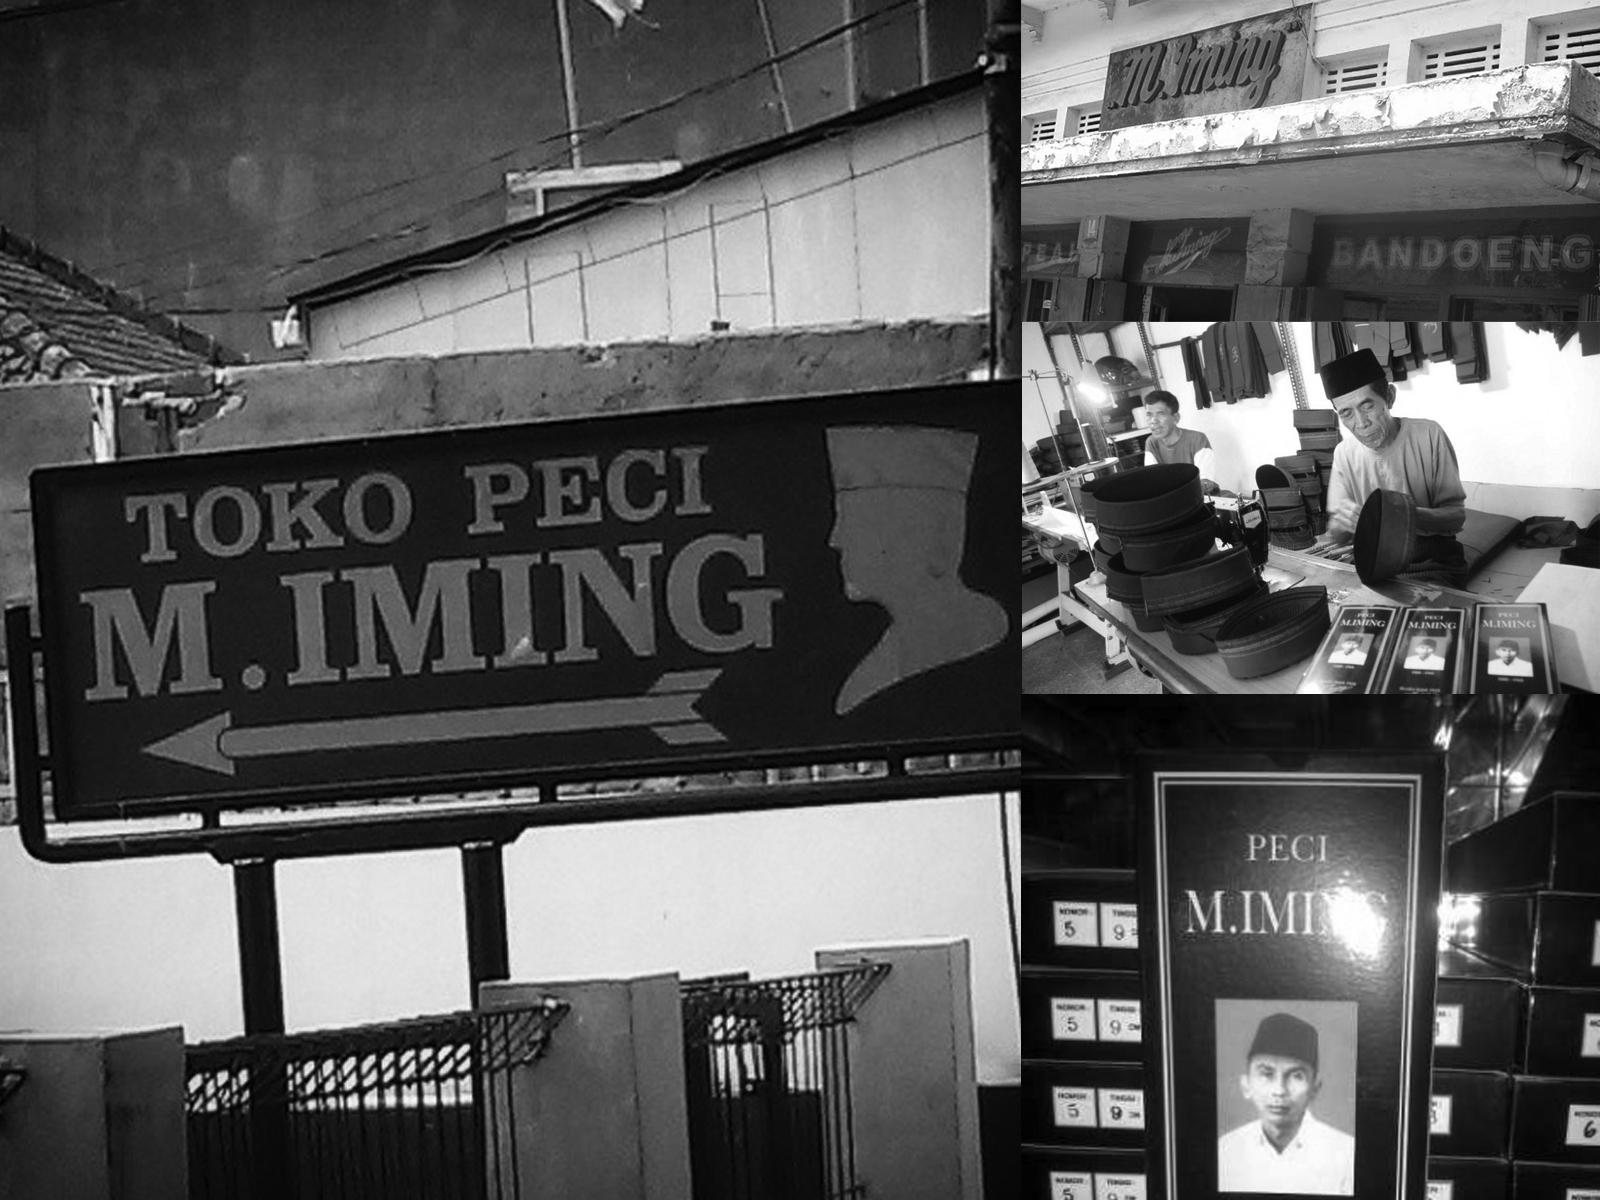 Sejarah Peci M Iming Bandung